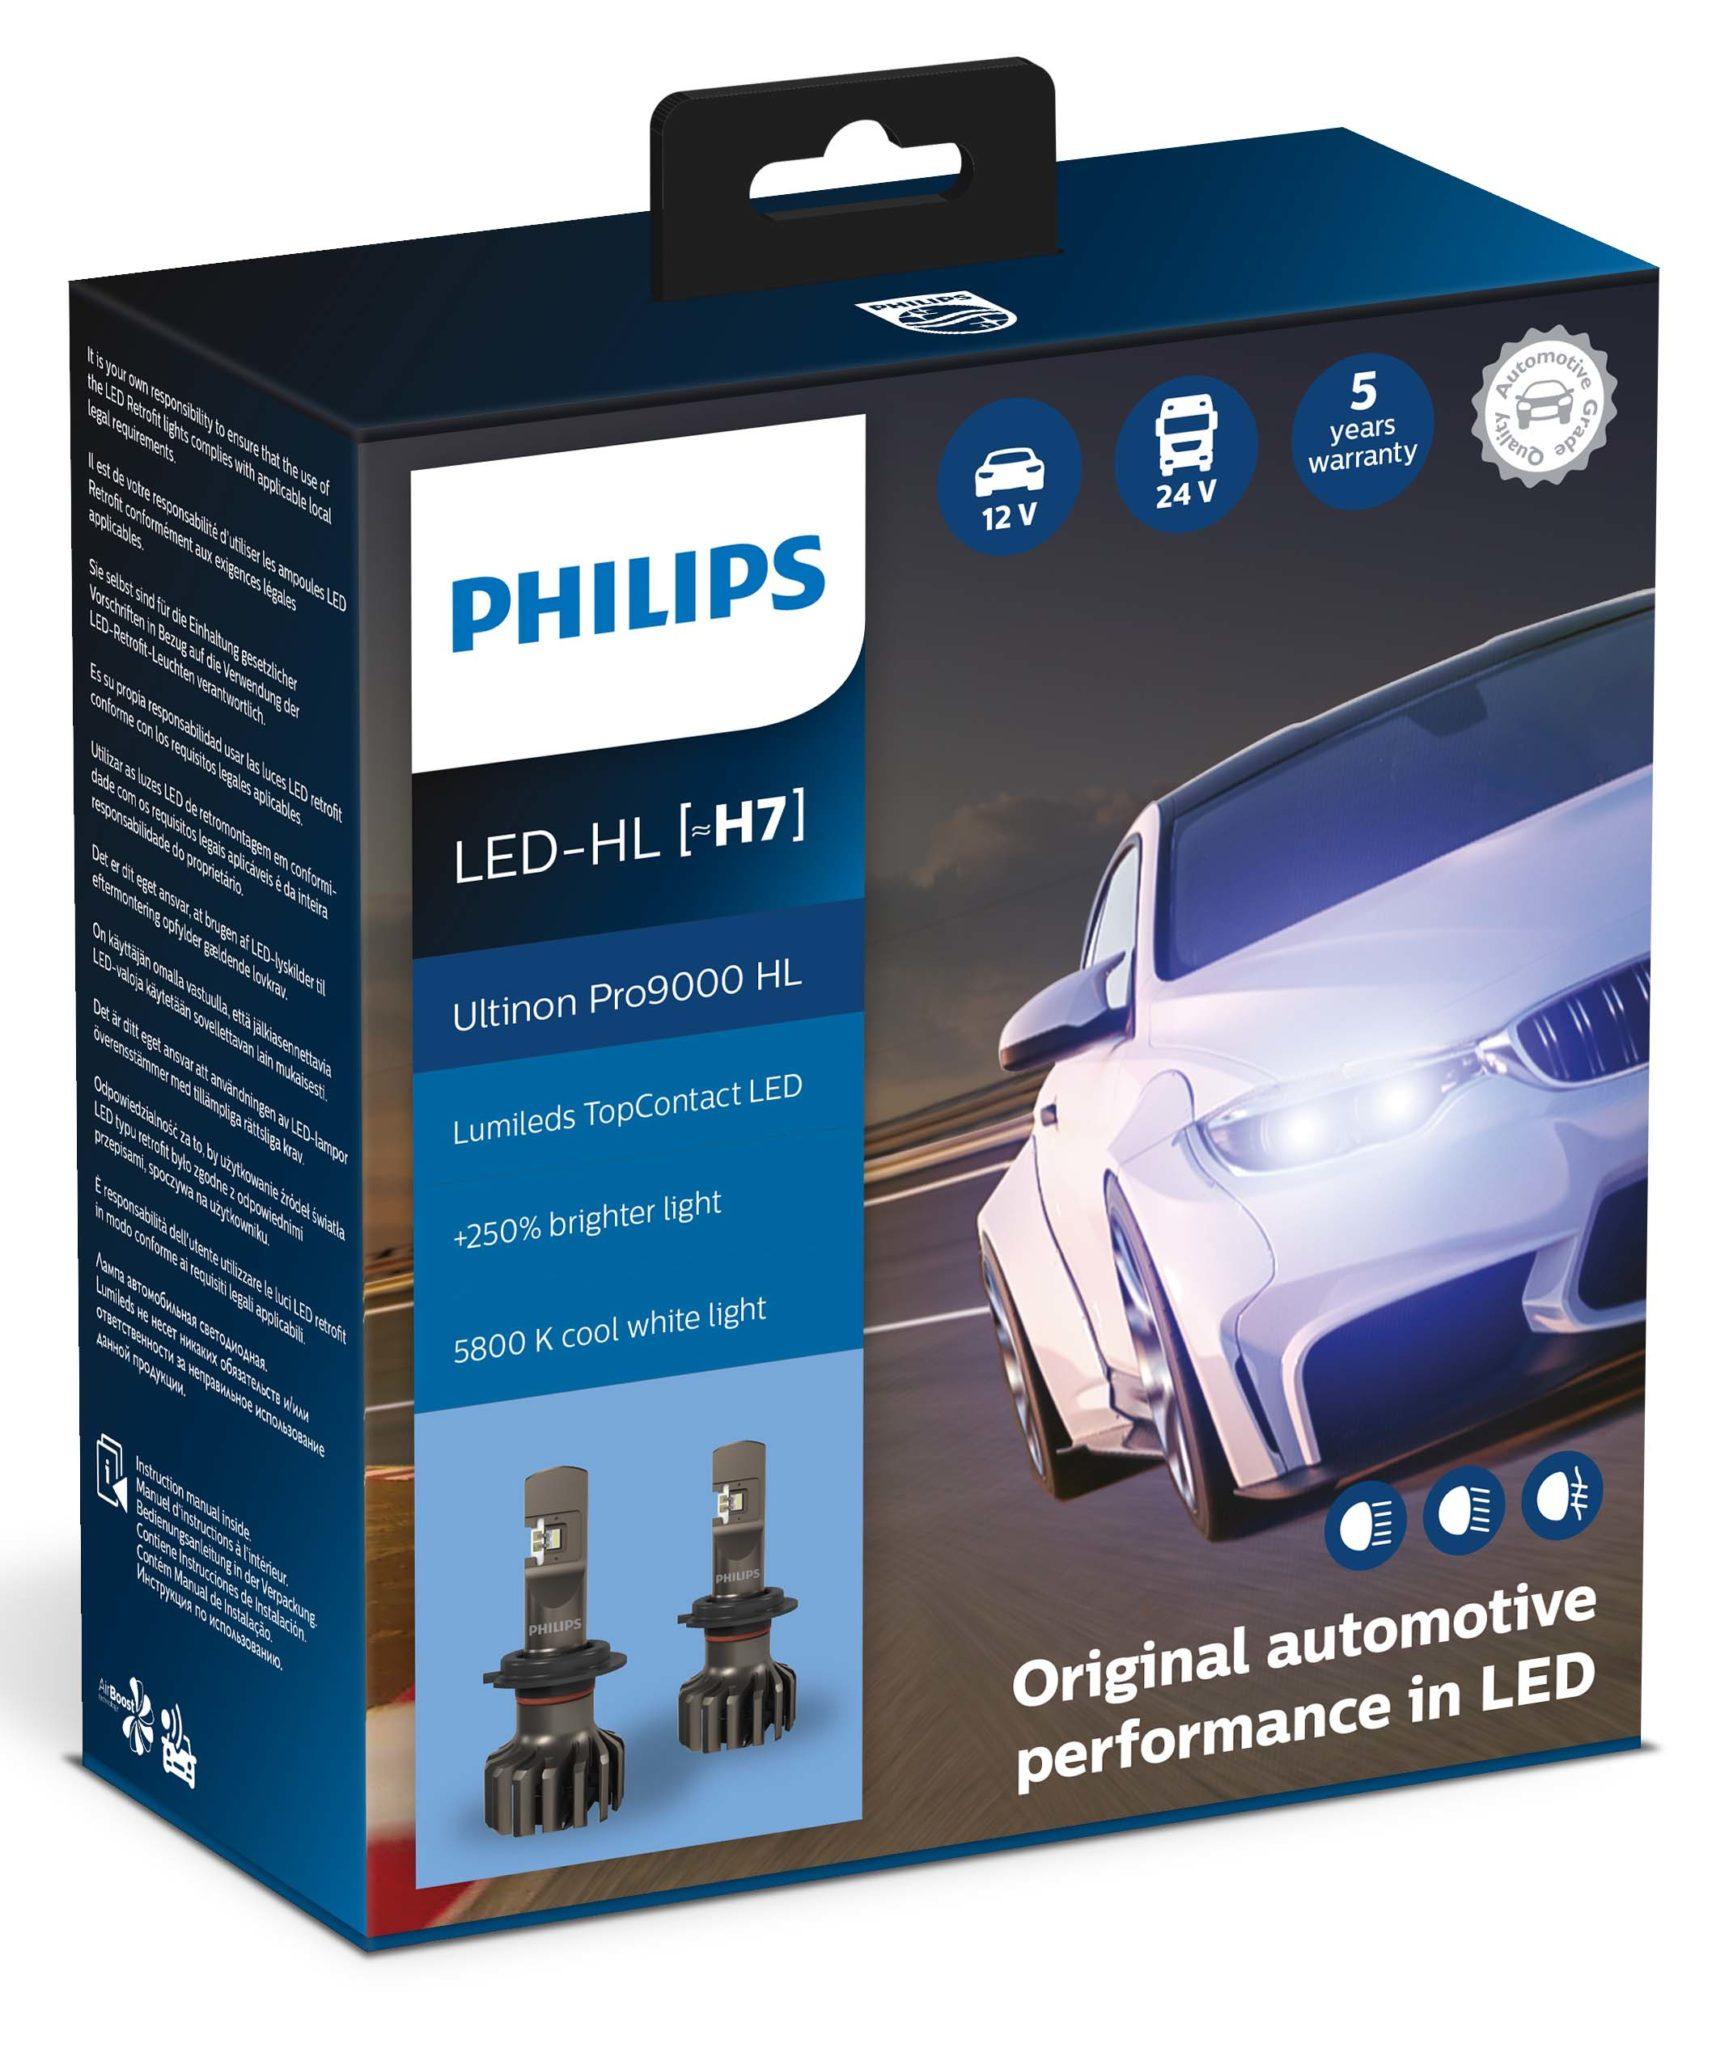 Philips Lumiled 3-2-1729x2048